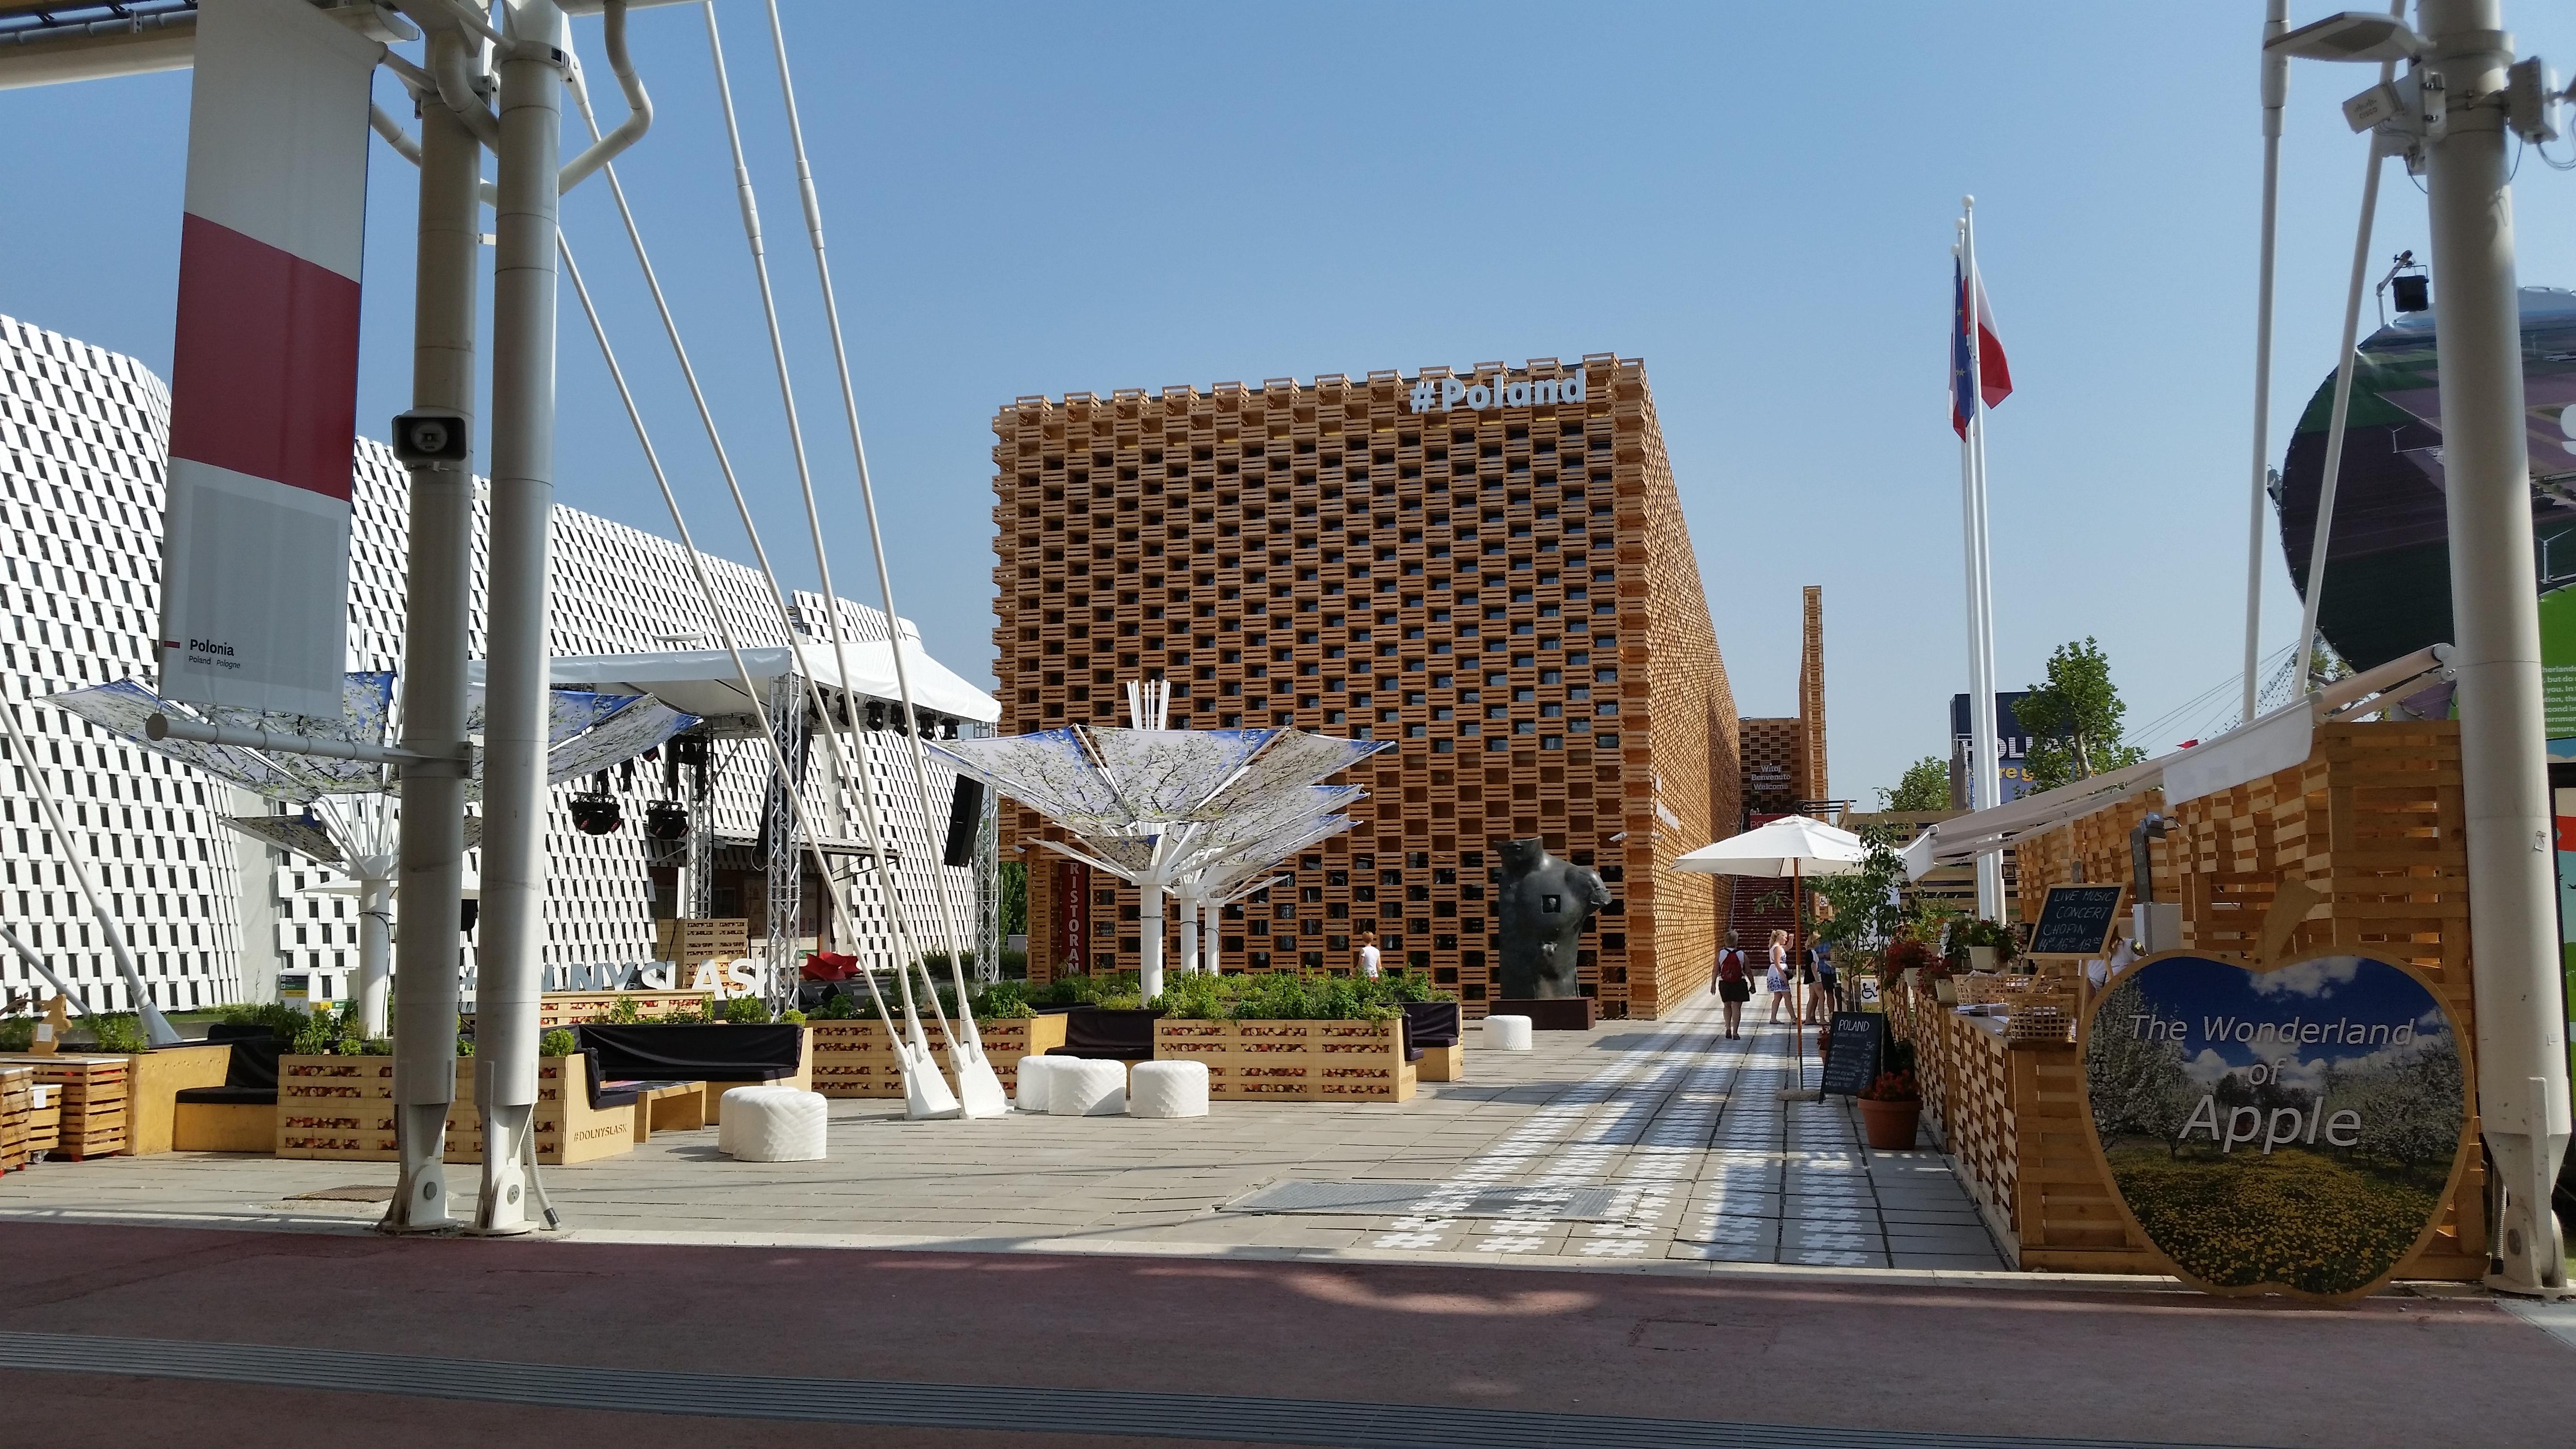 file expo milano 2015 pavilion of wikimedia. Black Bedroom Furniture Sets. Home Design Ideas